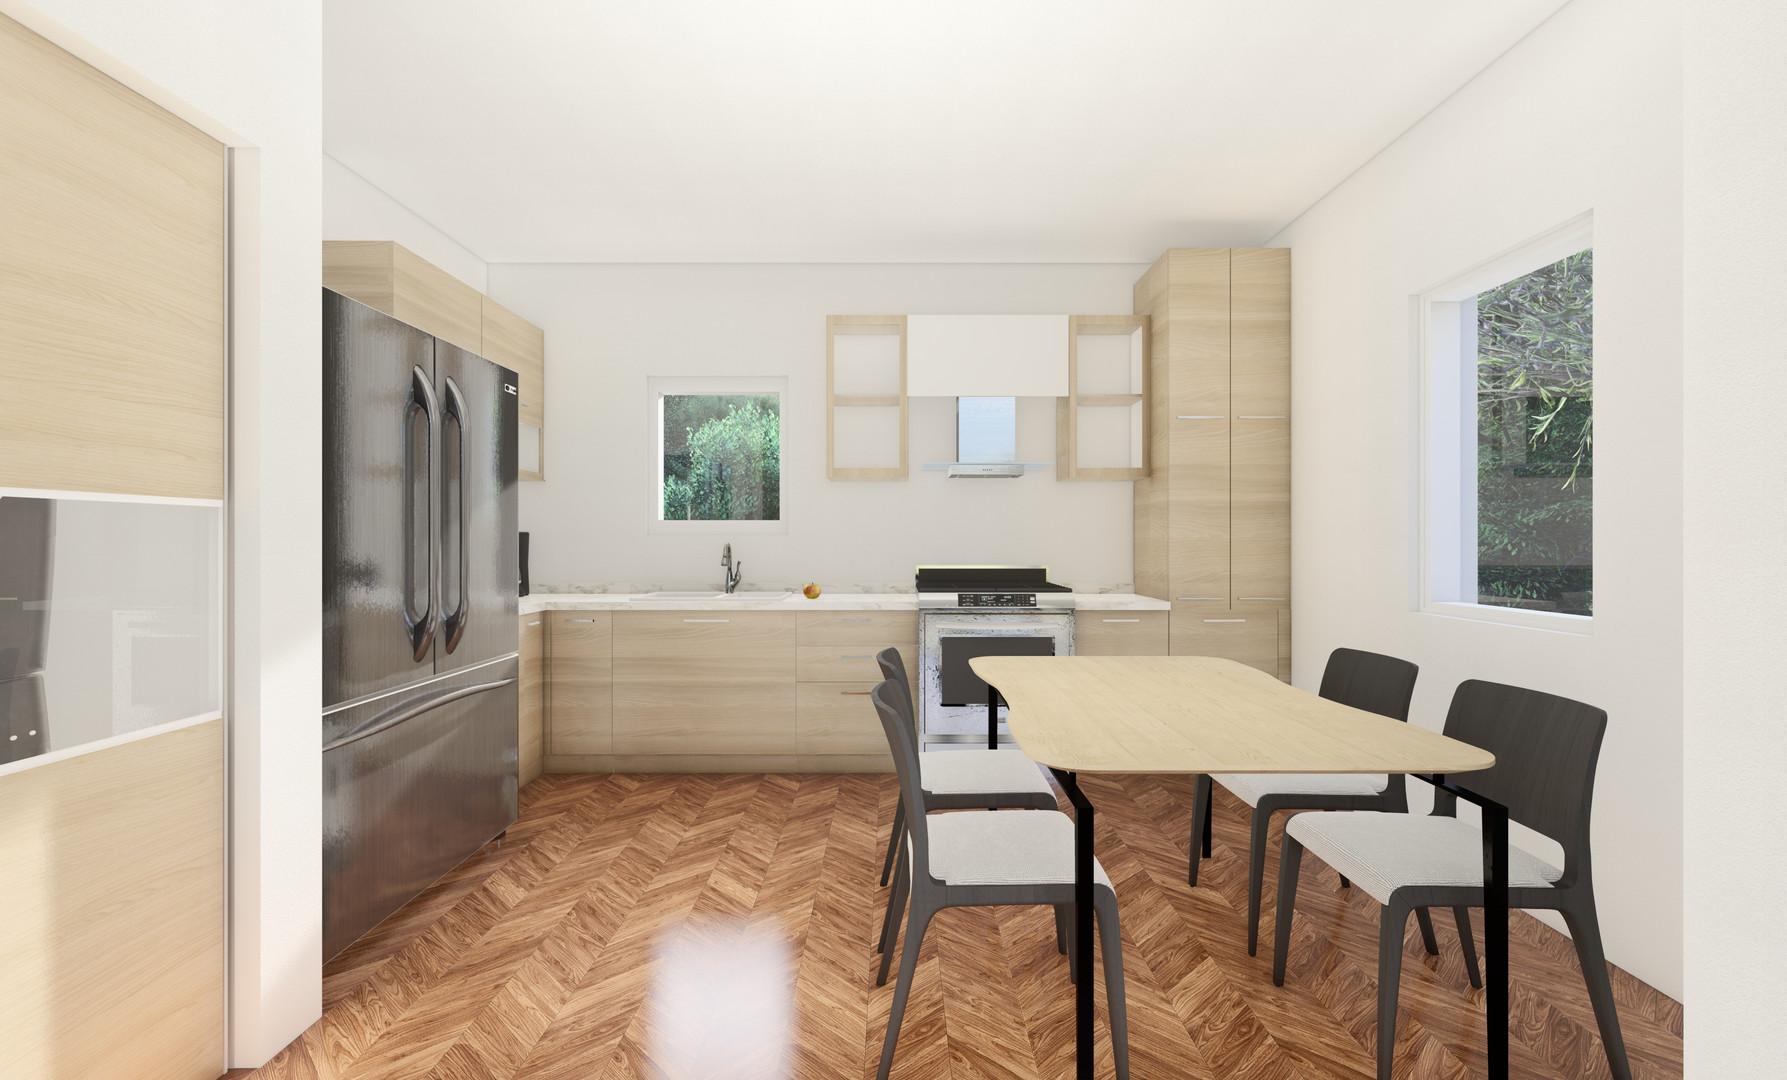 Mockupsecond floor kitchen dining.jpg